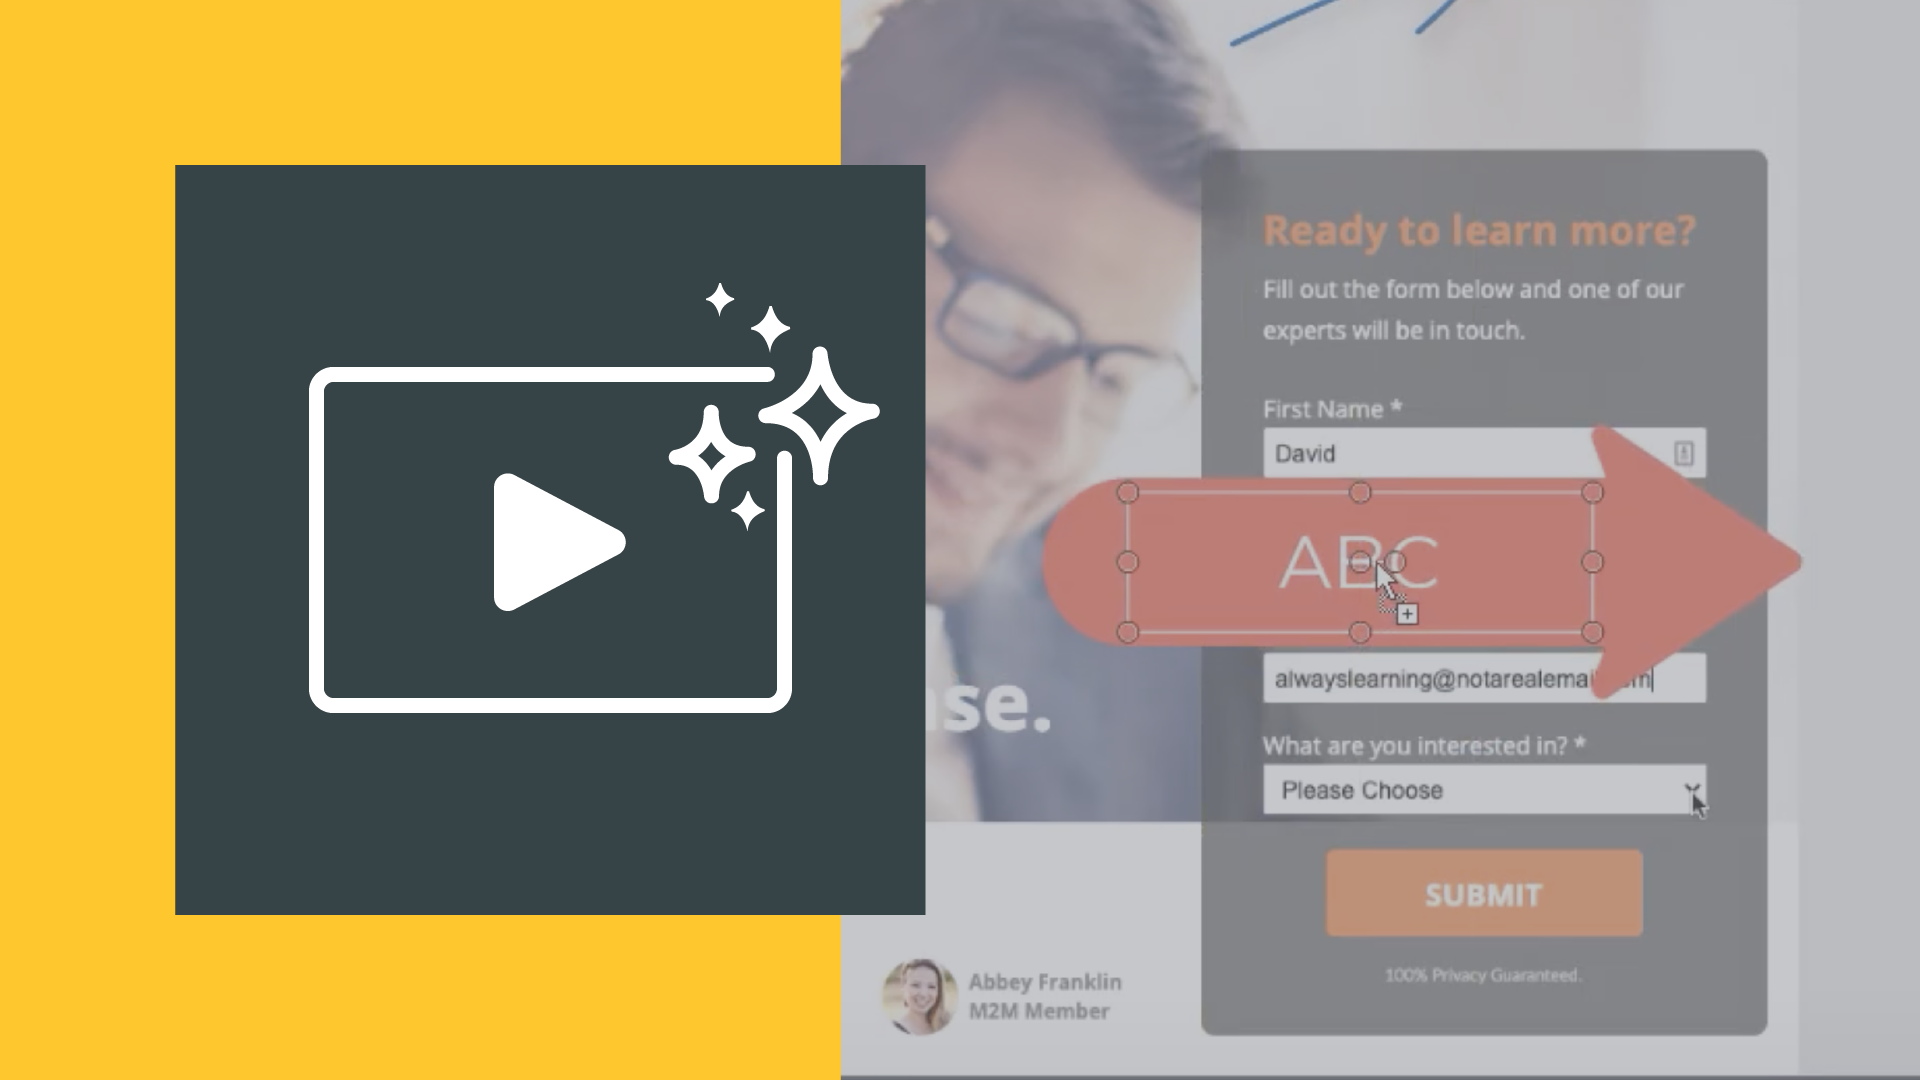 Screen Recording Basics: Video Editing, Part 2